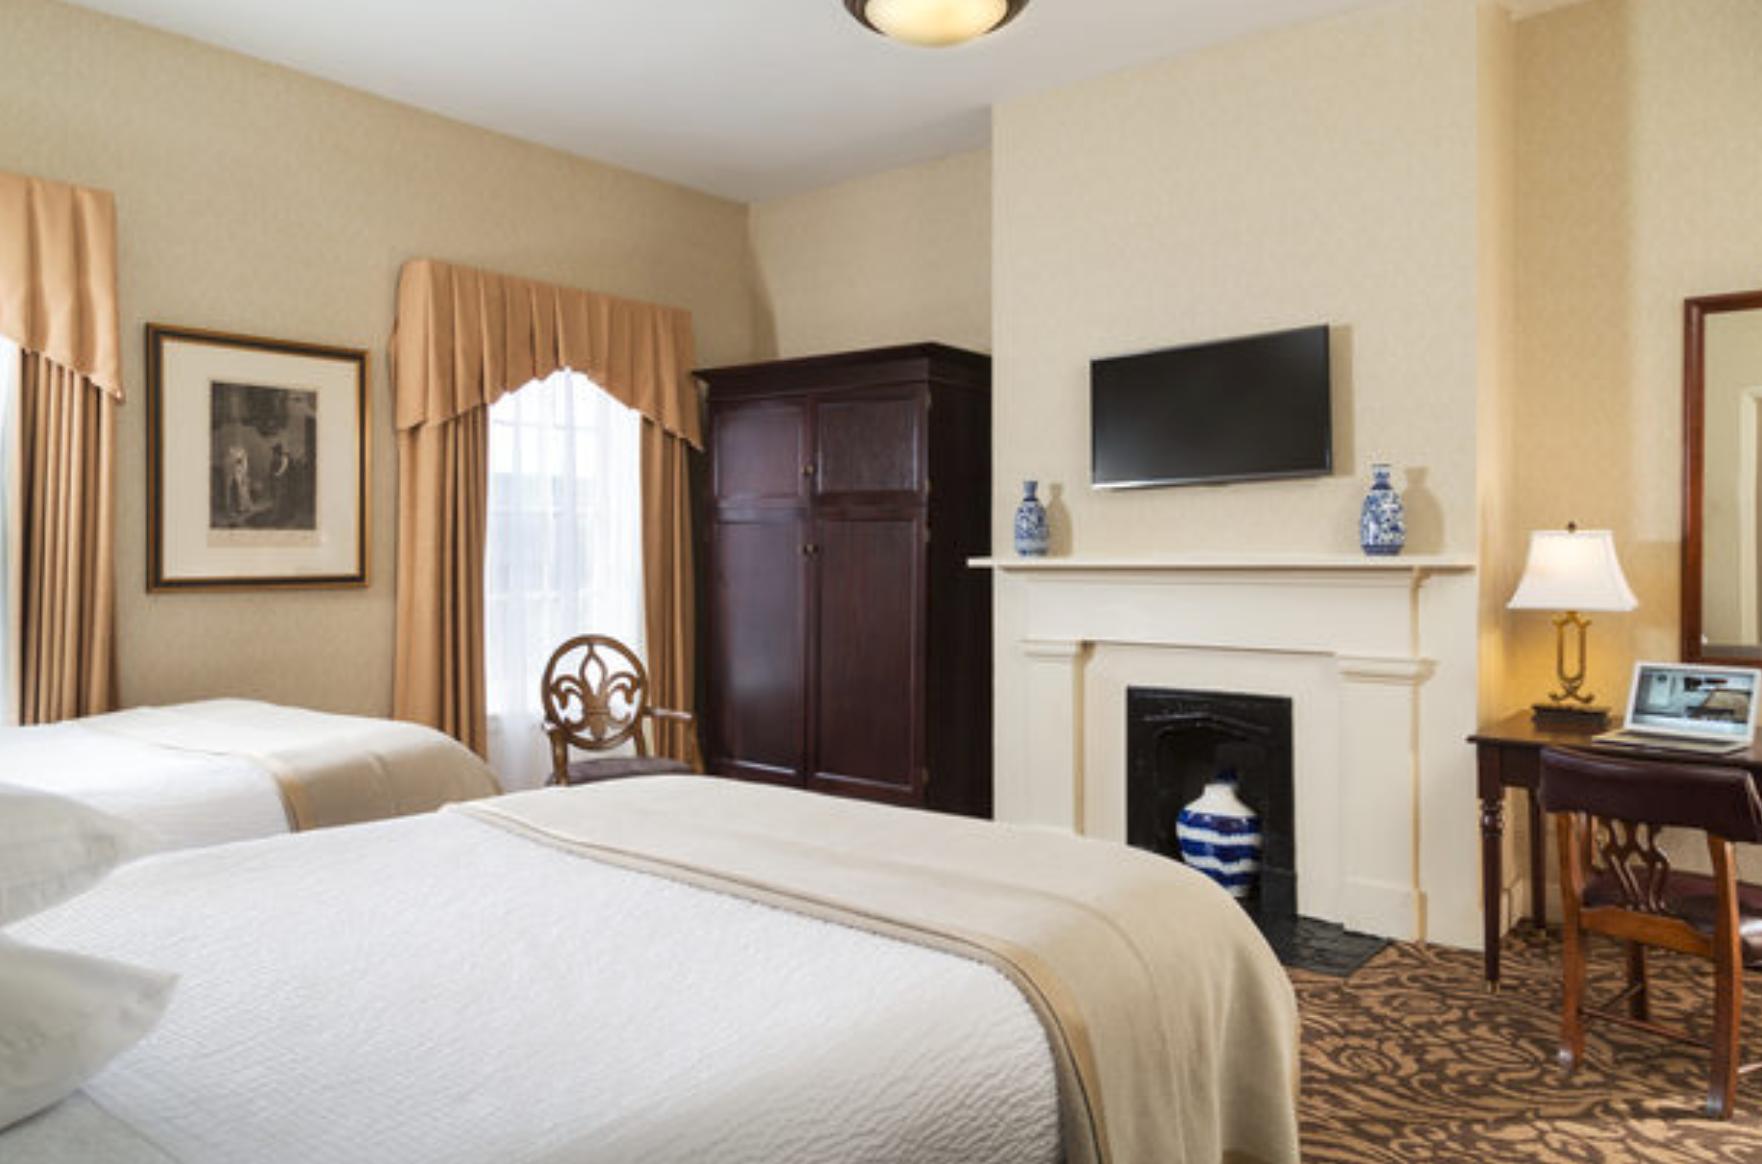 https://www.hotelsbyday.com/_data/default-hotel_image/4/21822/screenshot-2020-09-11-at-12-11-43-am.png